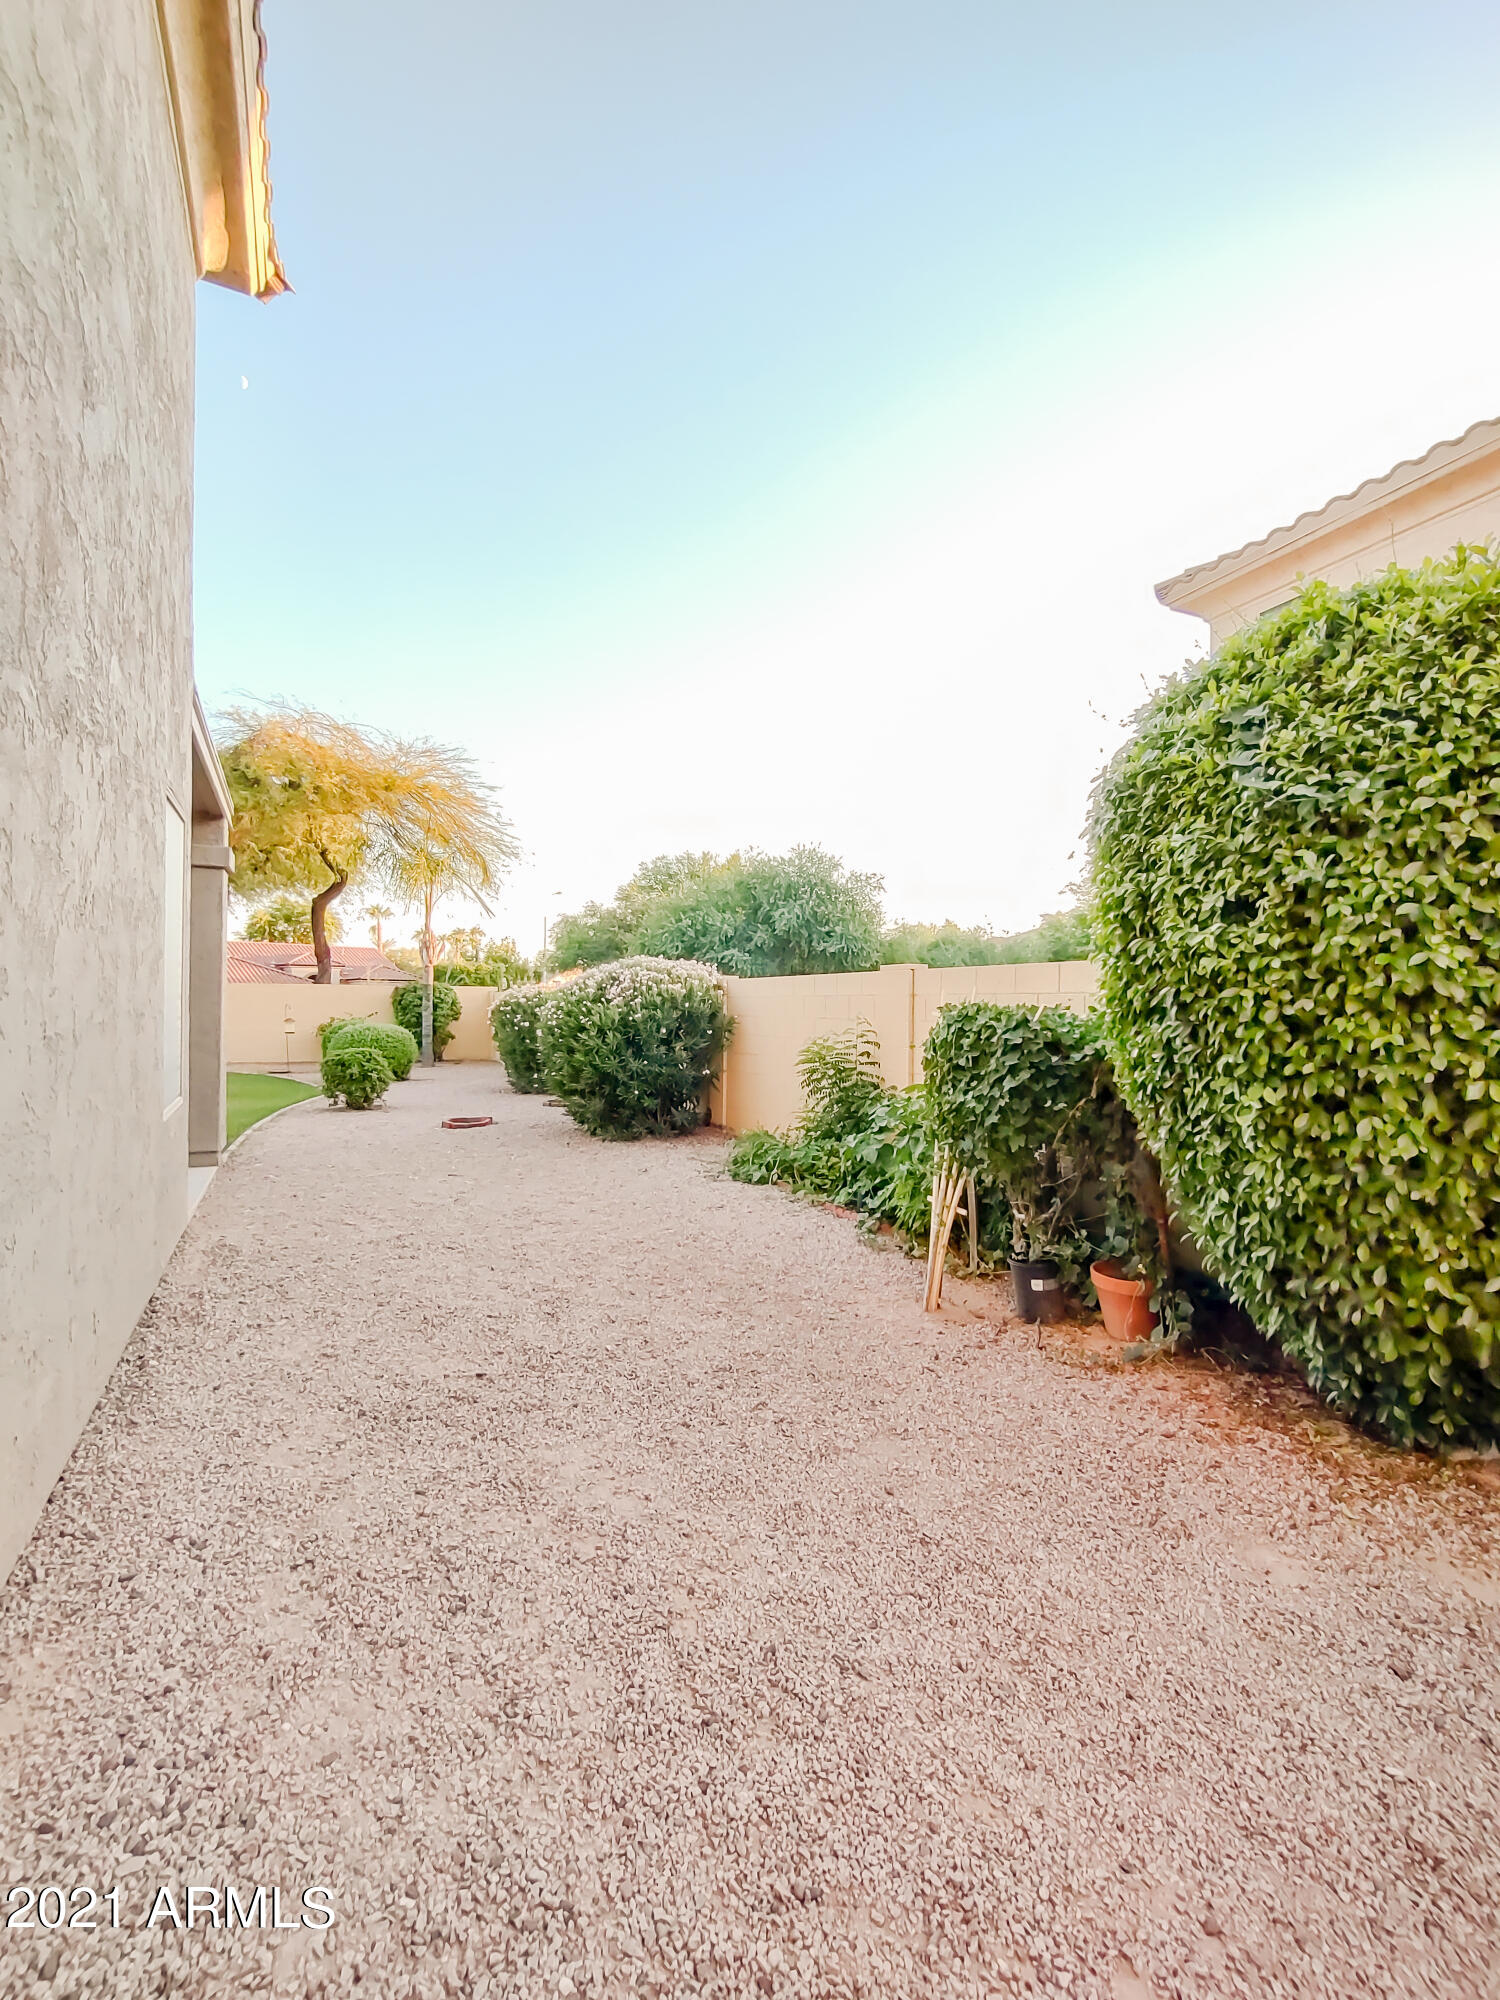 MLS 6293534 1195 W REMINGTON Drive, Chandler, AZ 85286 Health Facilities